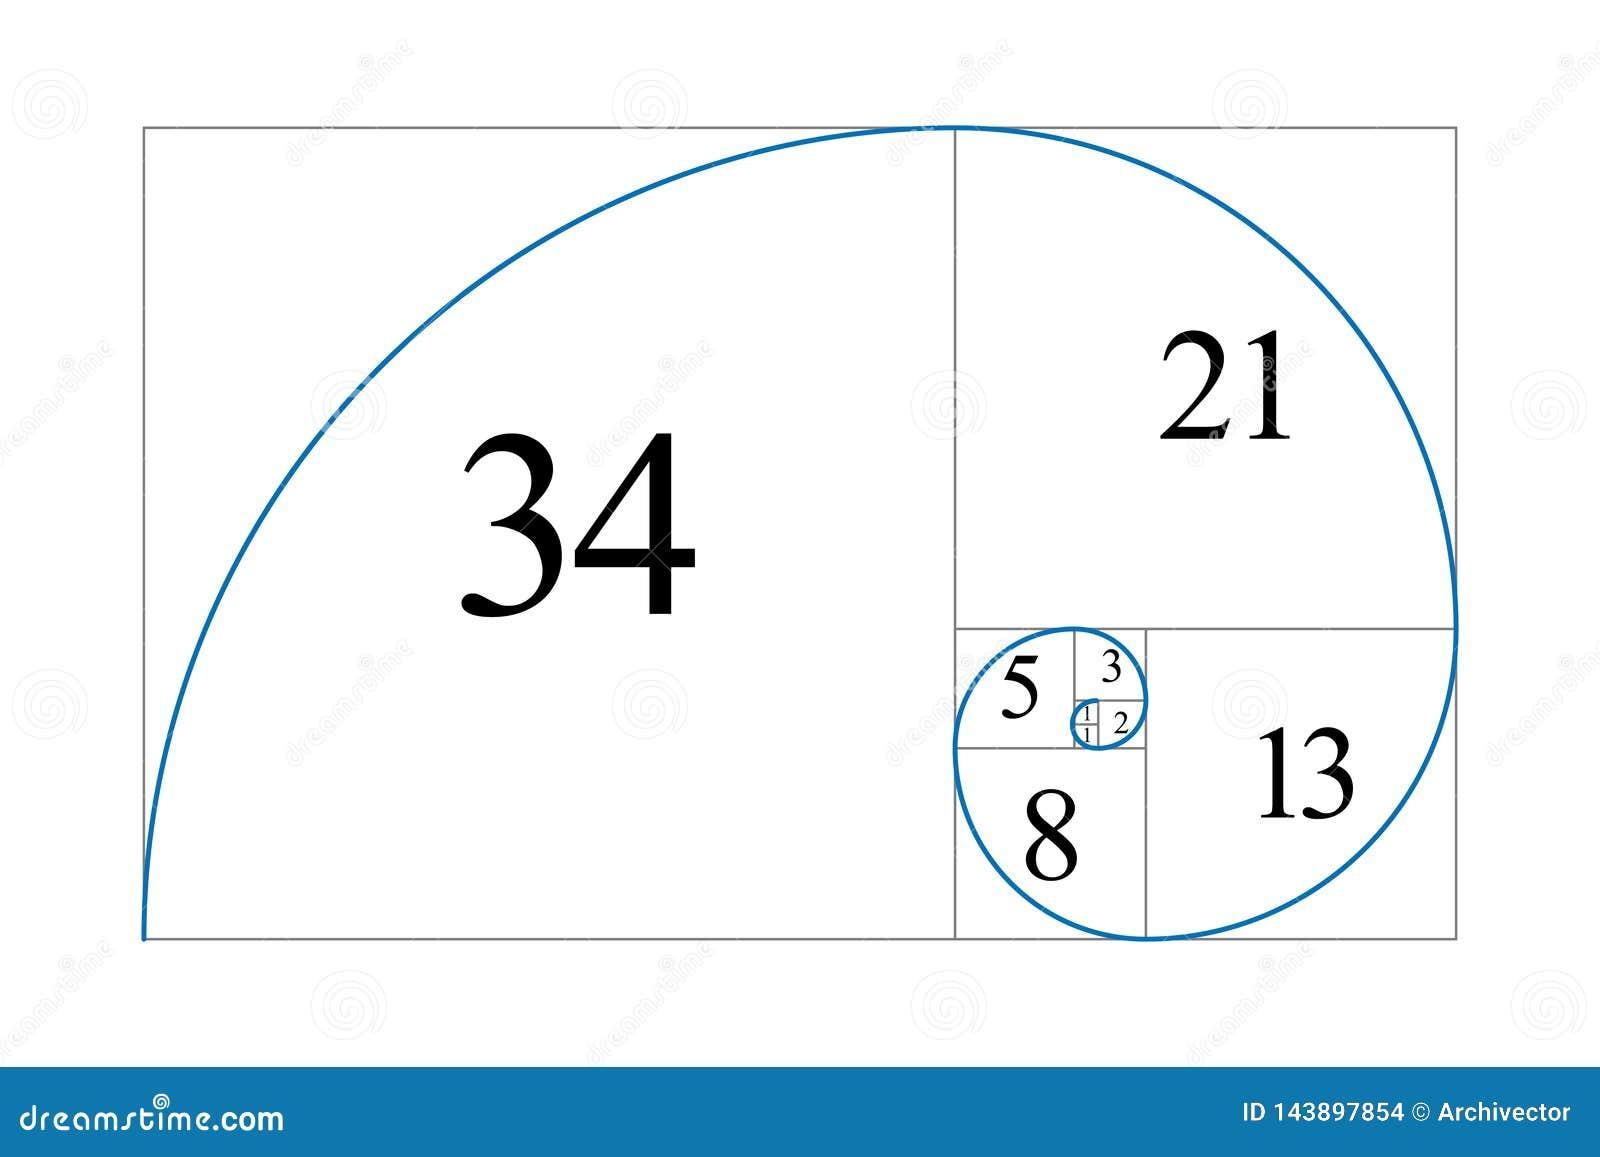 Golden ratio. Fibonacci number